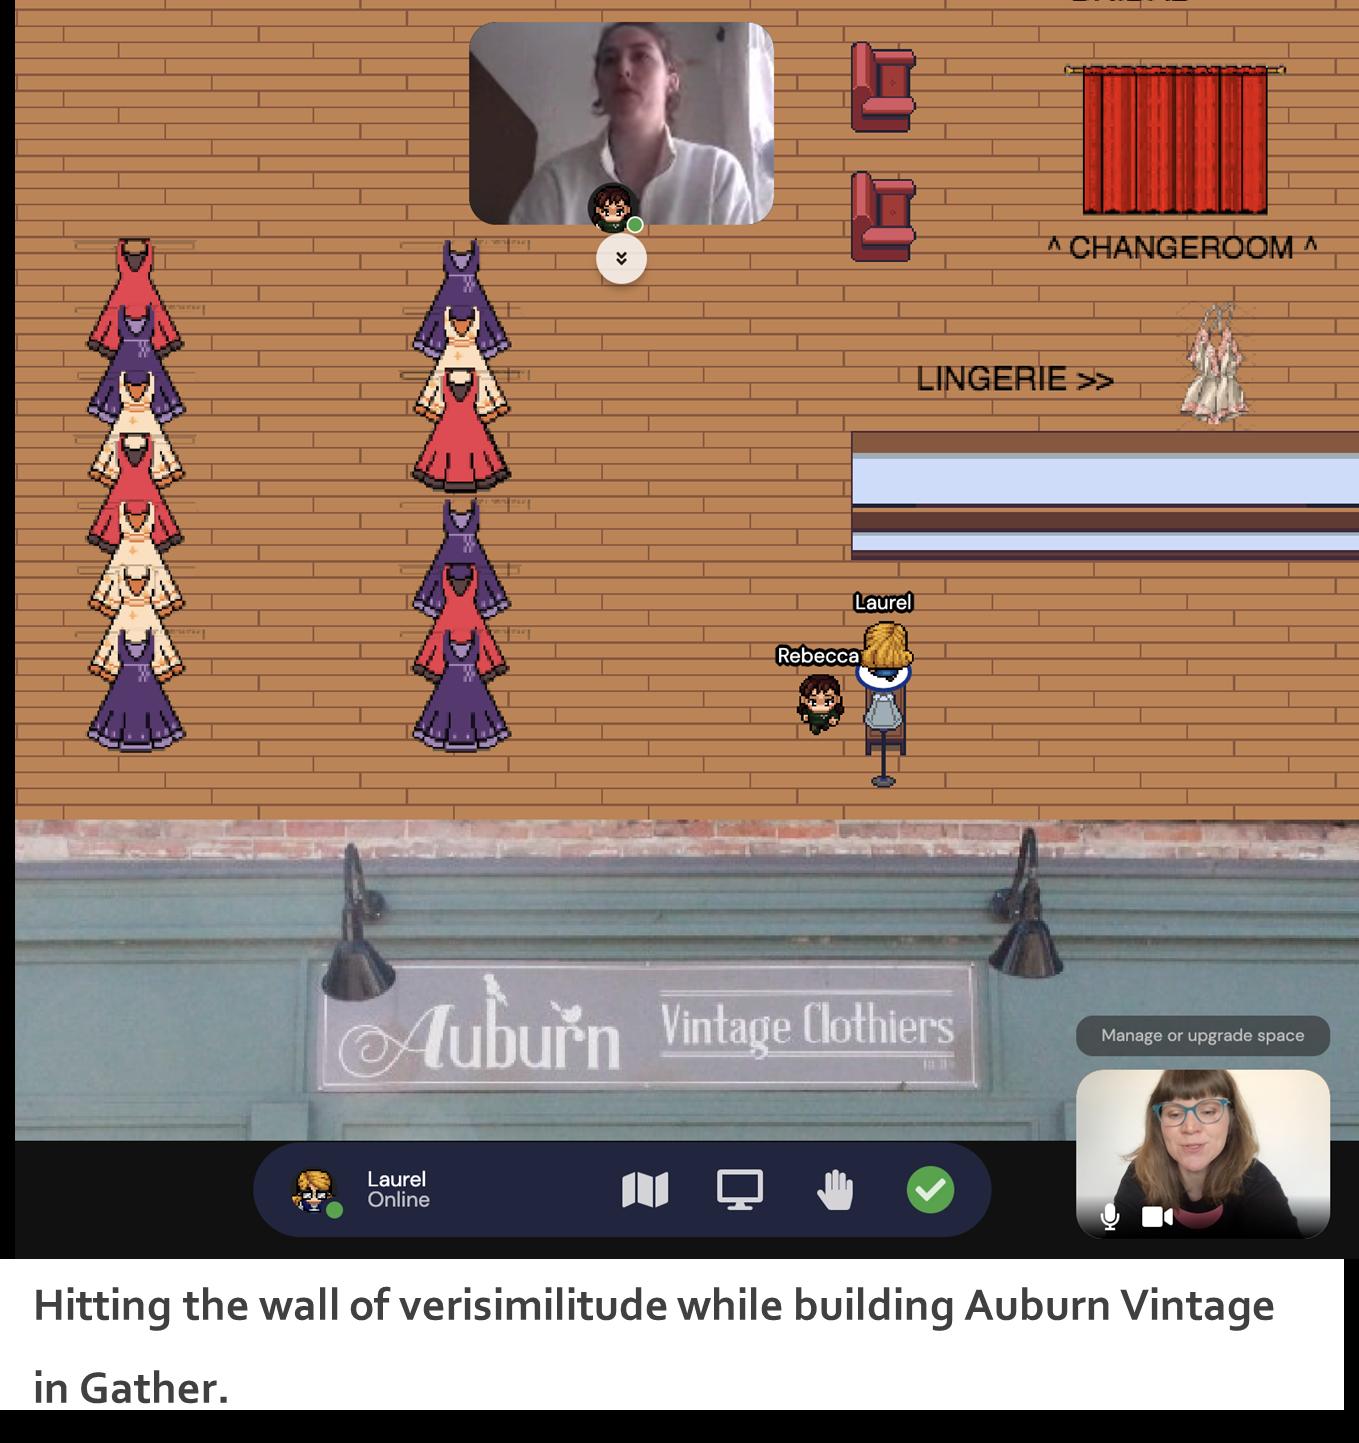 Building Auburn Vintage Store in Gather